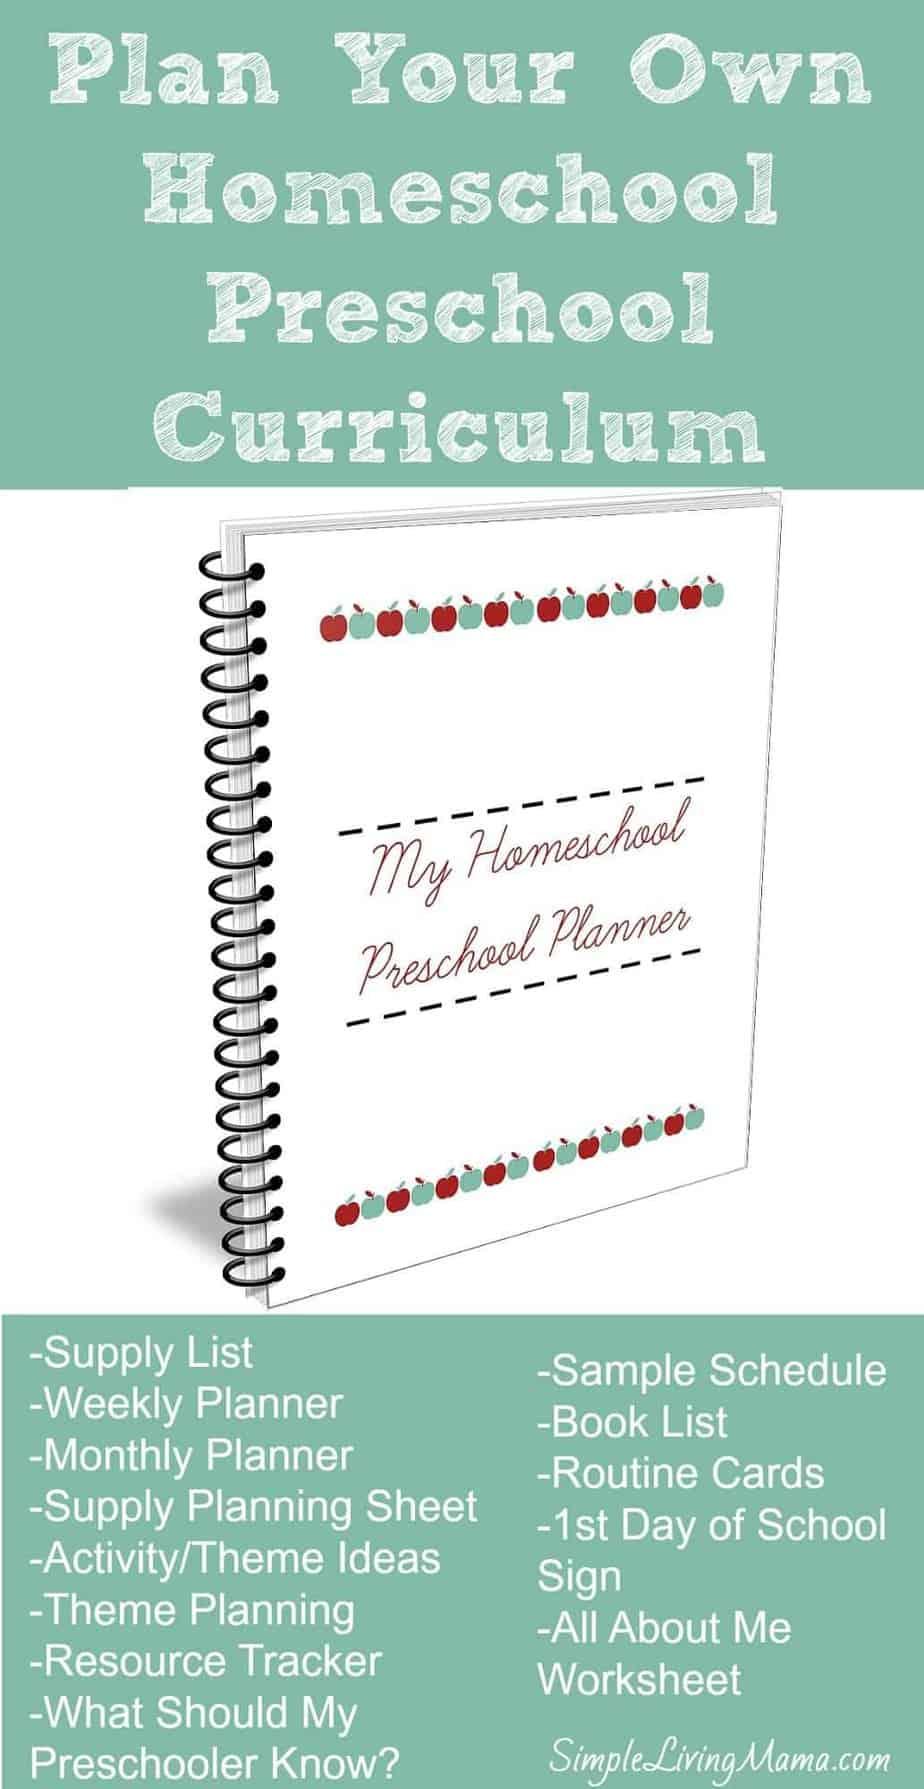 Plan Your Own Homeschool Preschool Curriculum with My Homeschool Preschool Planner!